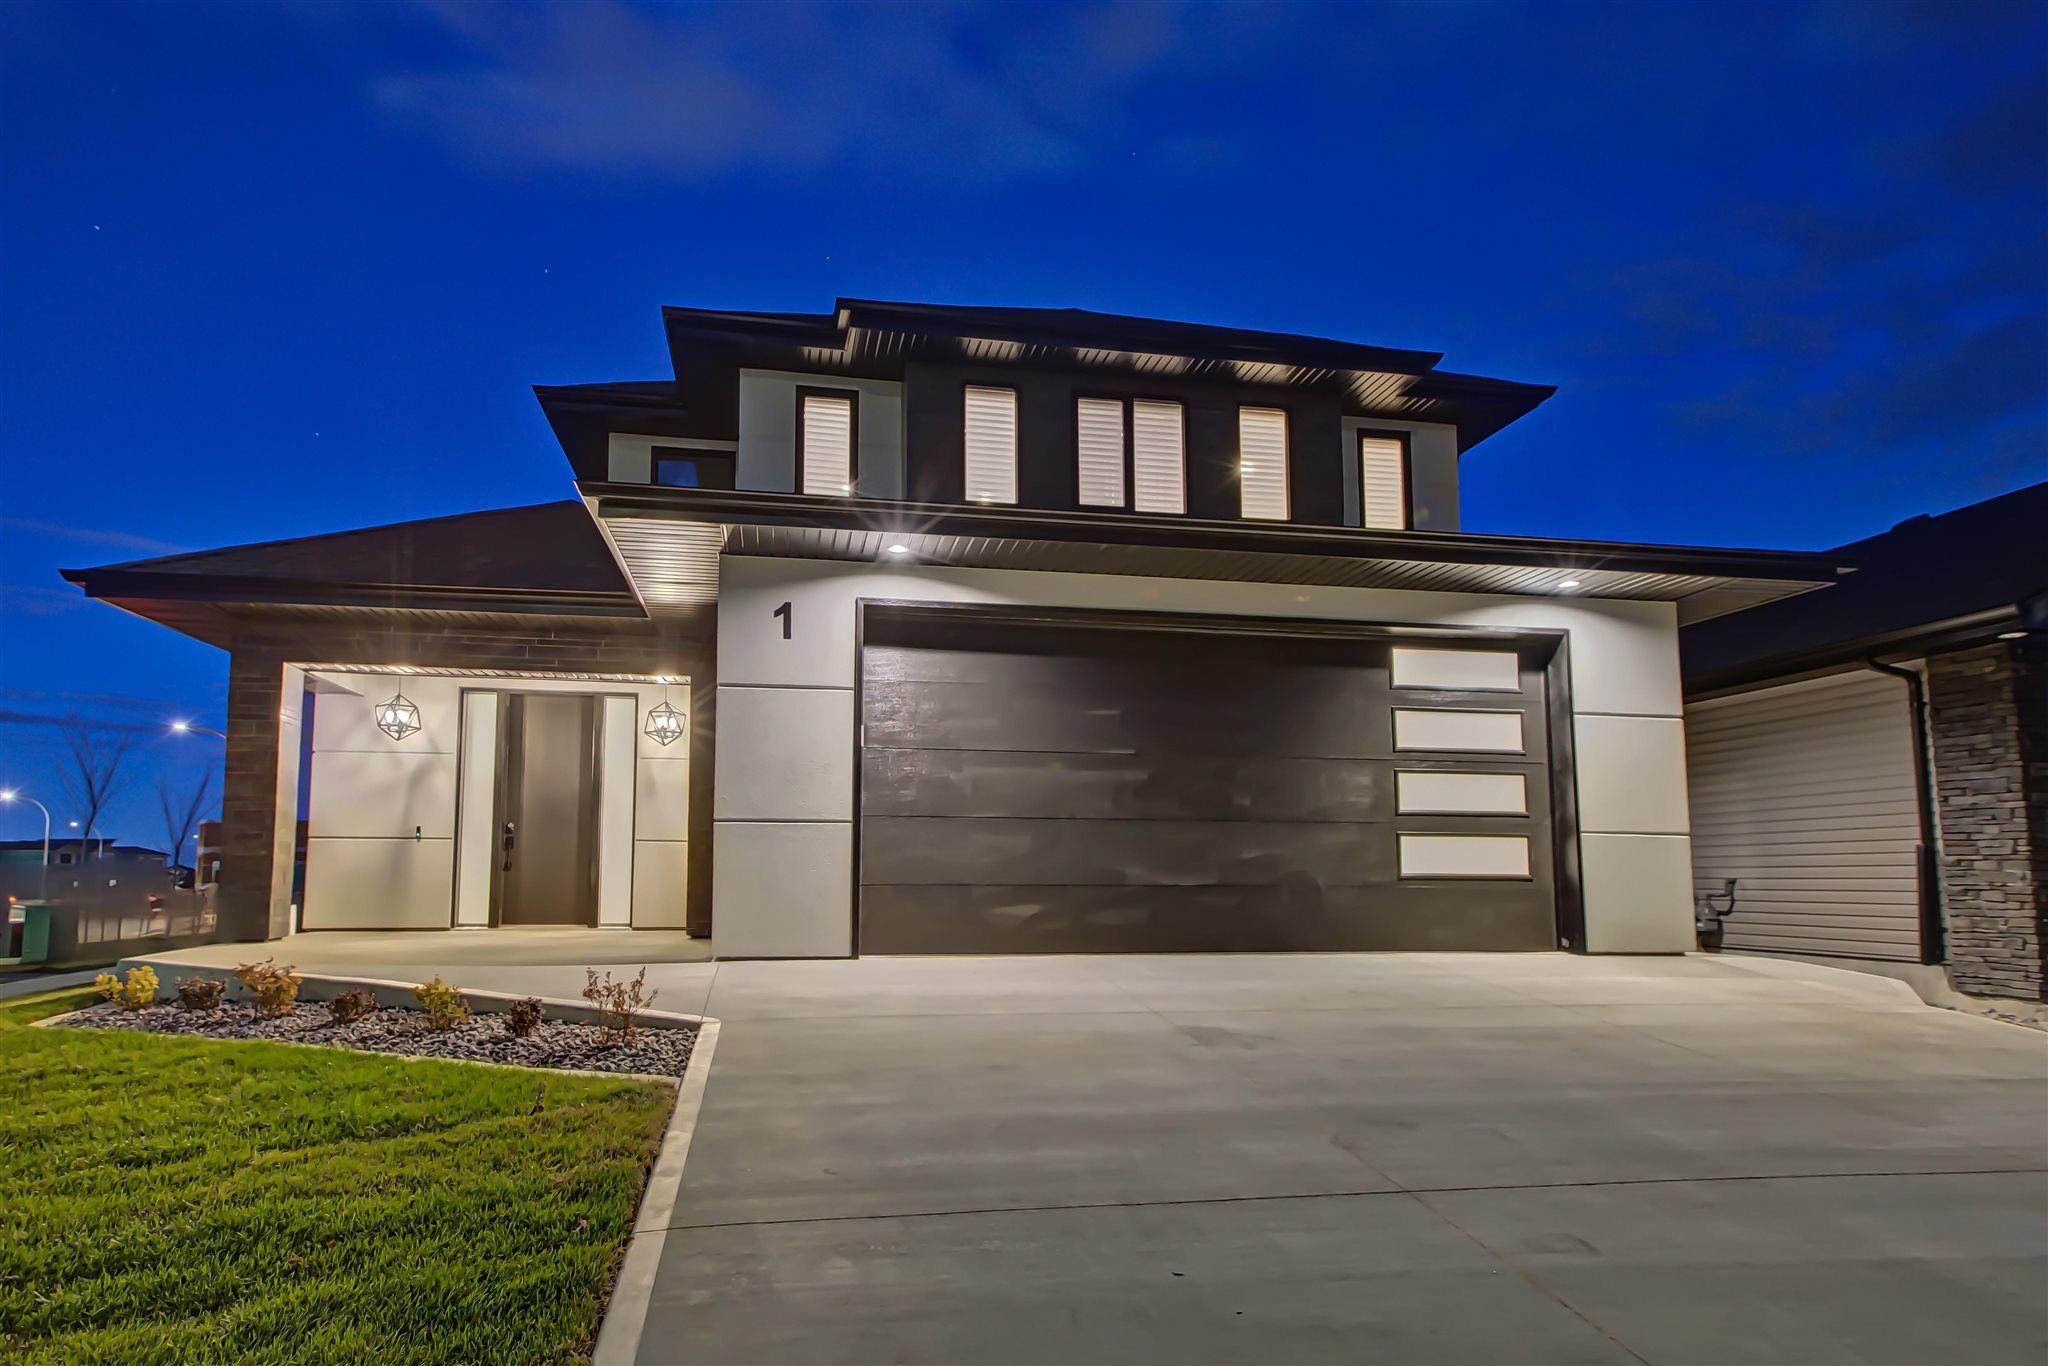 Main Photo: 1 SPARROW Close: Fort Saskatchewan House for sale : MLS®# E4246324